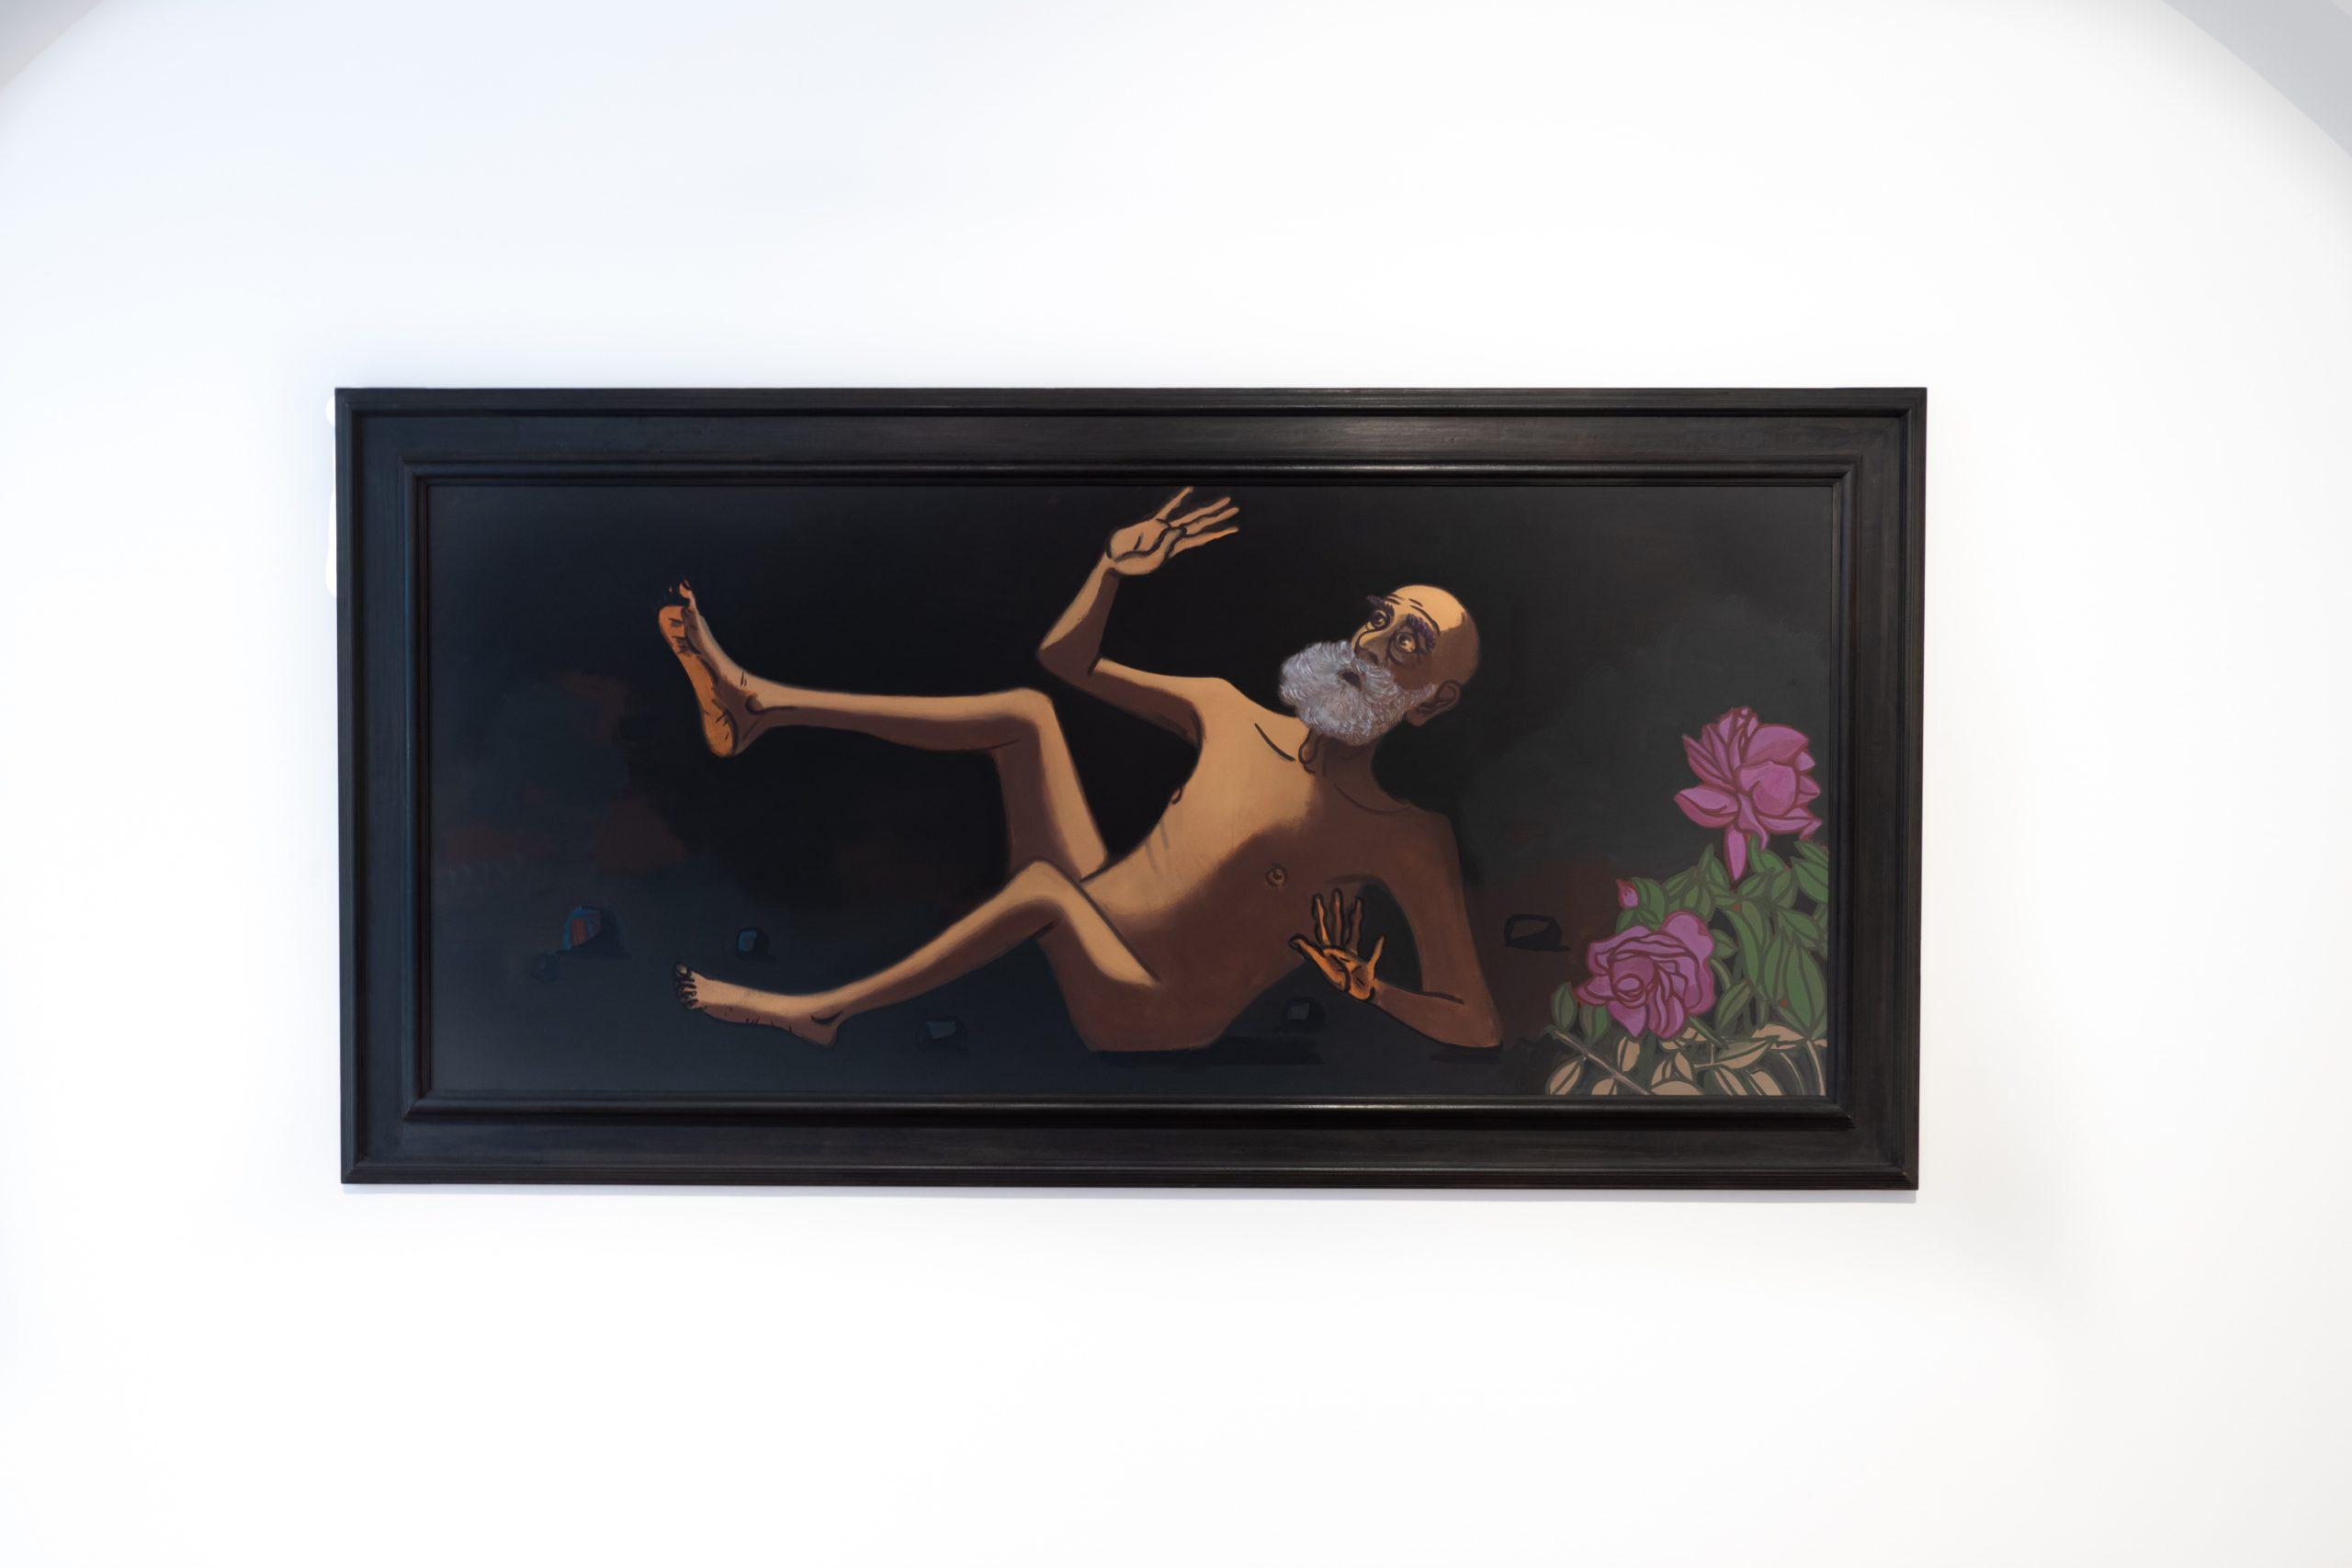 Hubert Schmalix Steve Oil on Canvas Painting Figurative Smolka Contemporary